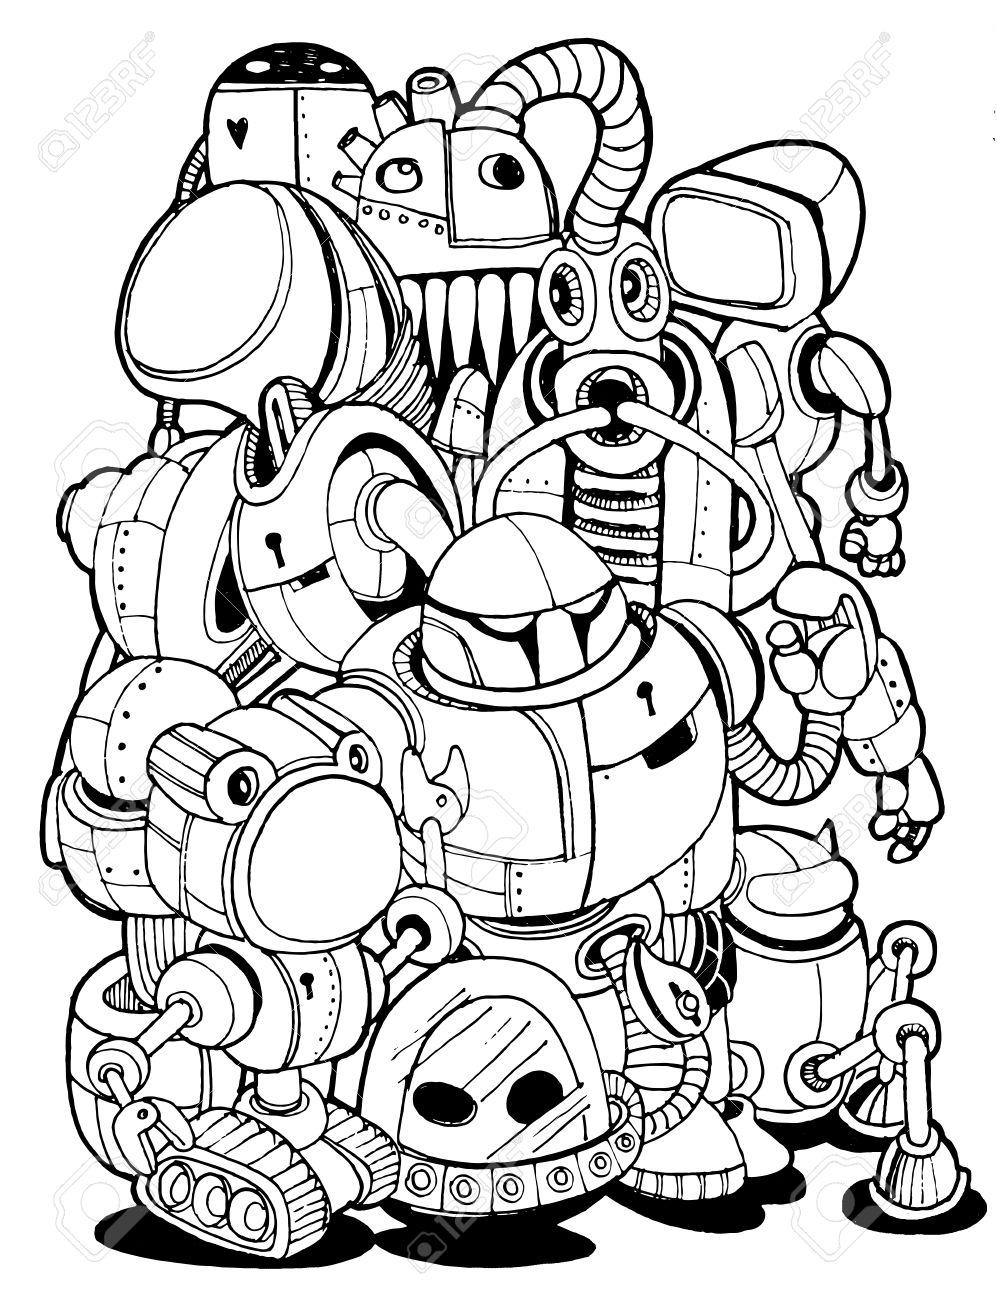 997x1300 Hand Drawn Vector Illustration Of Doodle Robot Element